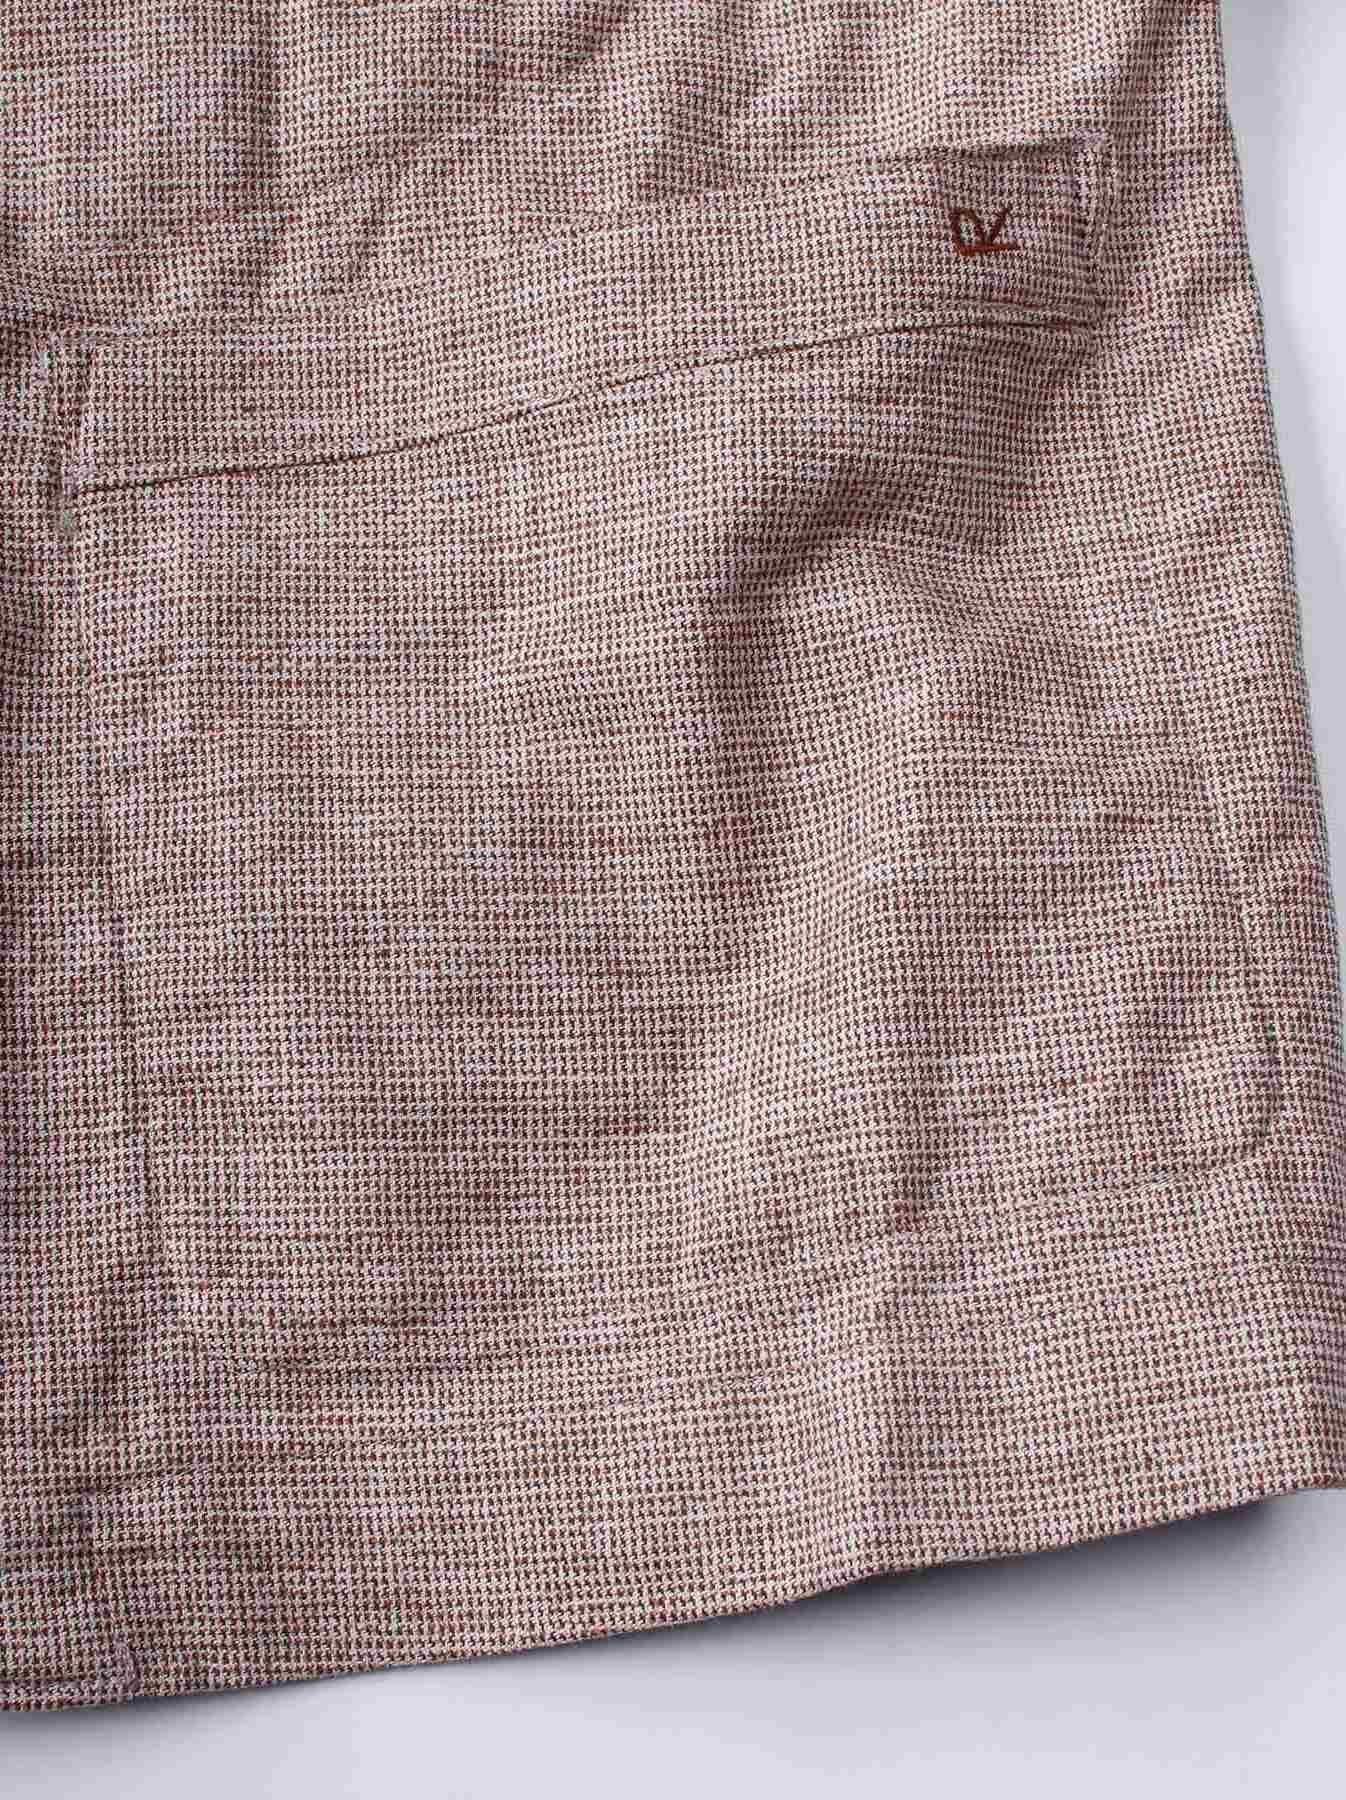 Cotton Tweed 908 Jacket-8